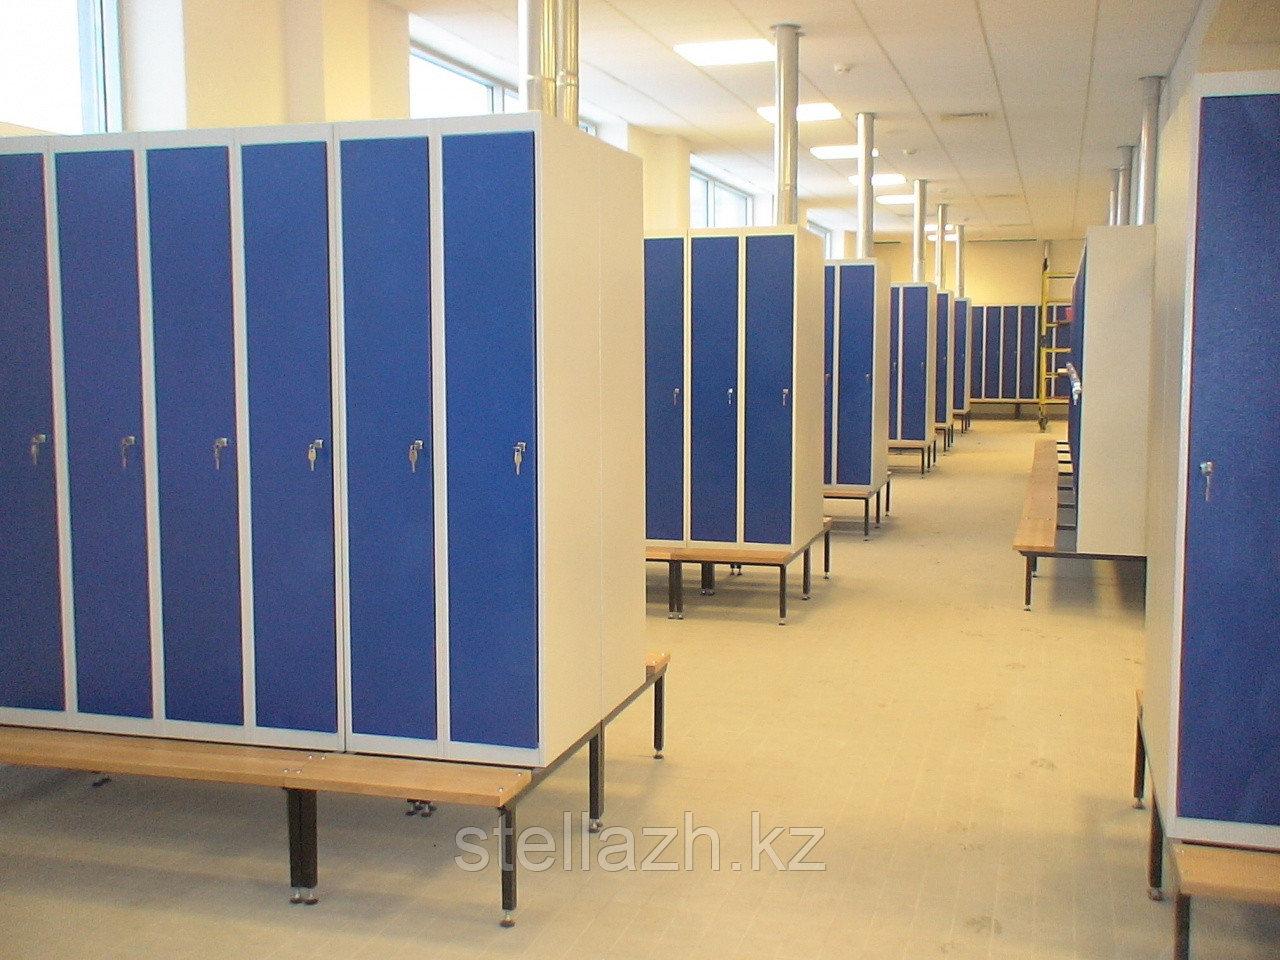 Шкаф для спецодежды персонала